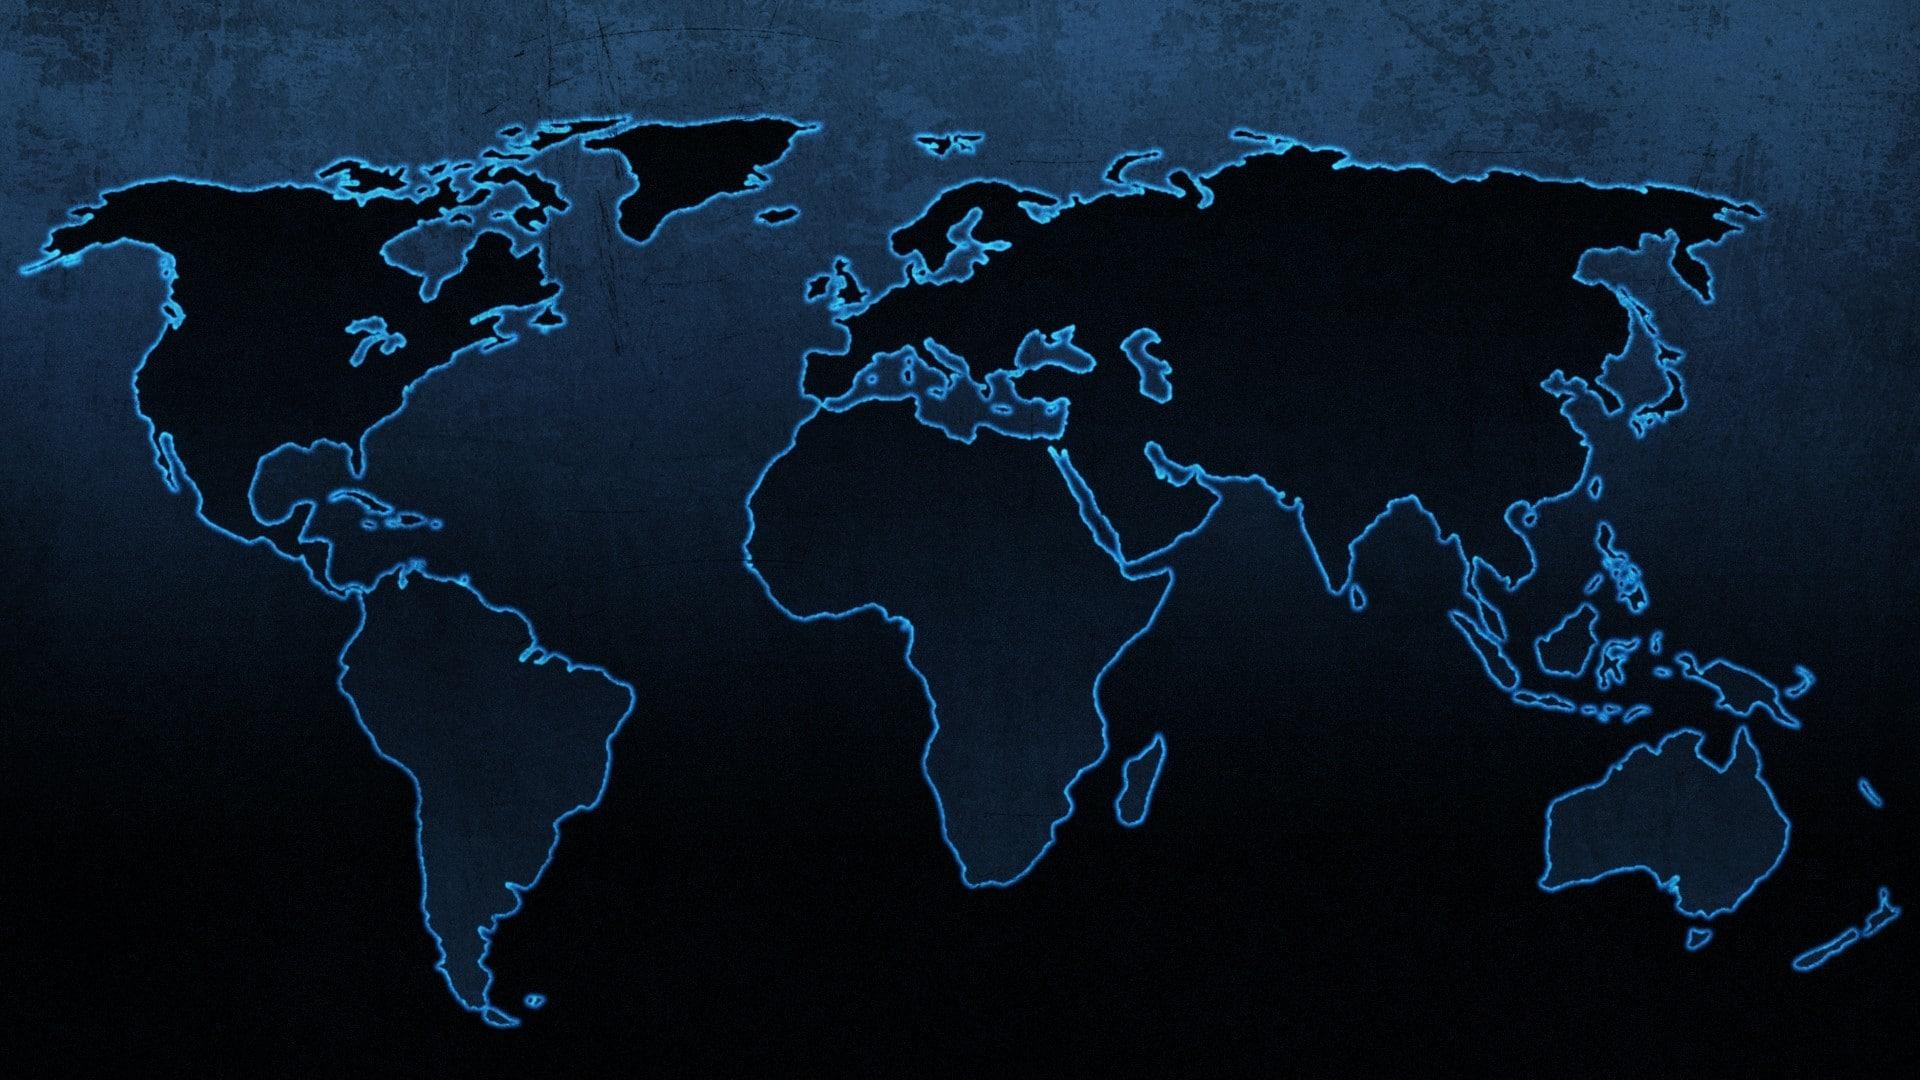 Free World Map Wallpaper